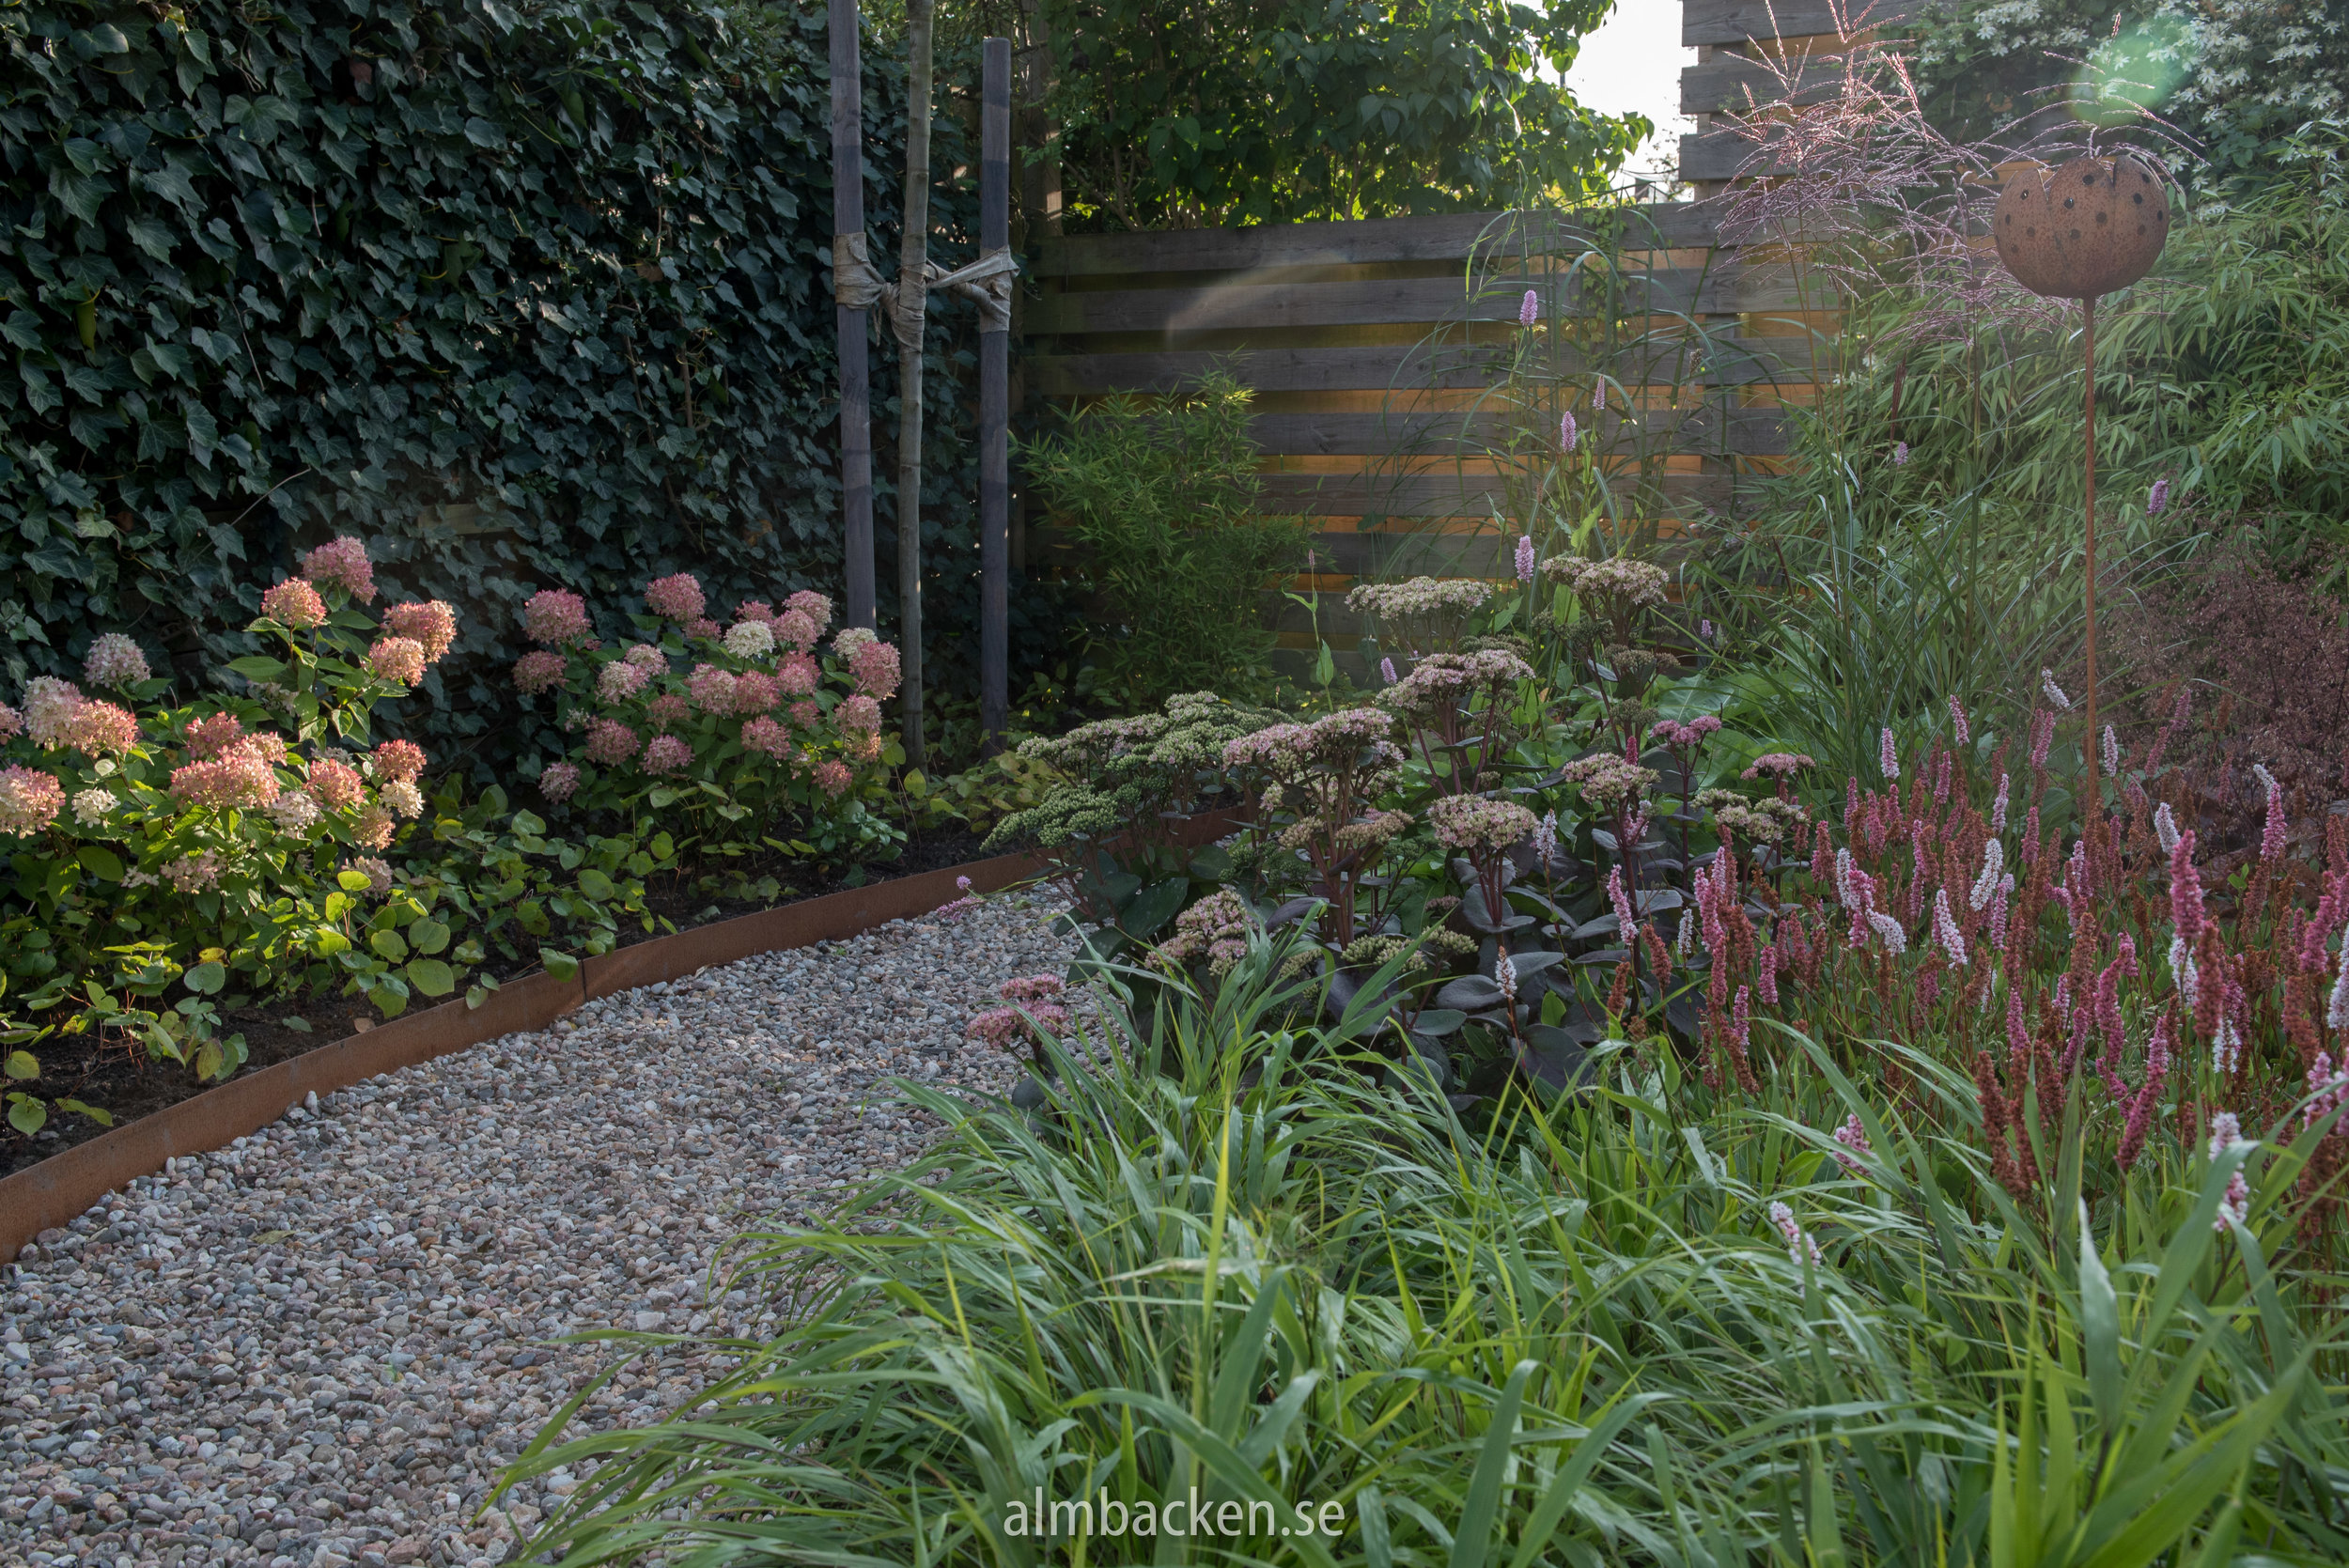 almbacken-tradgardsdesign-hakonegräs-hortensia-littlelime.jpg